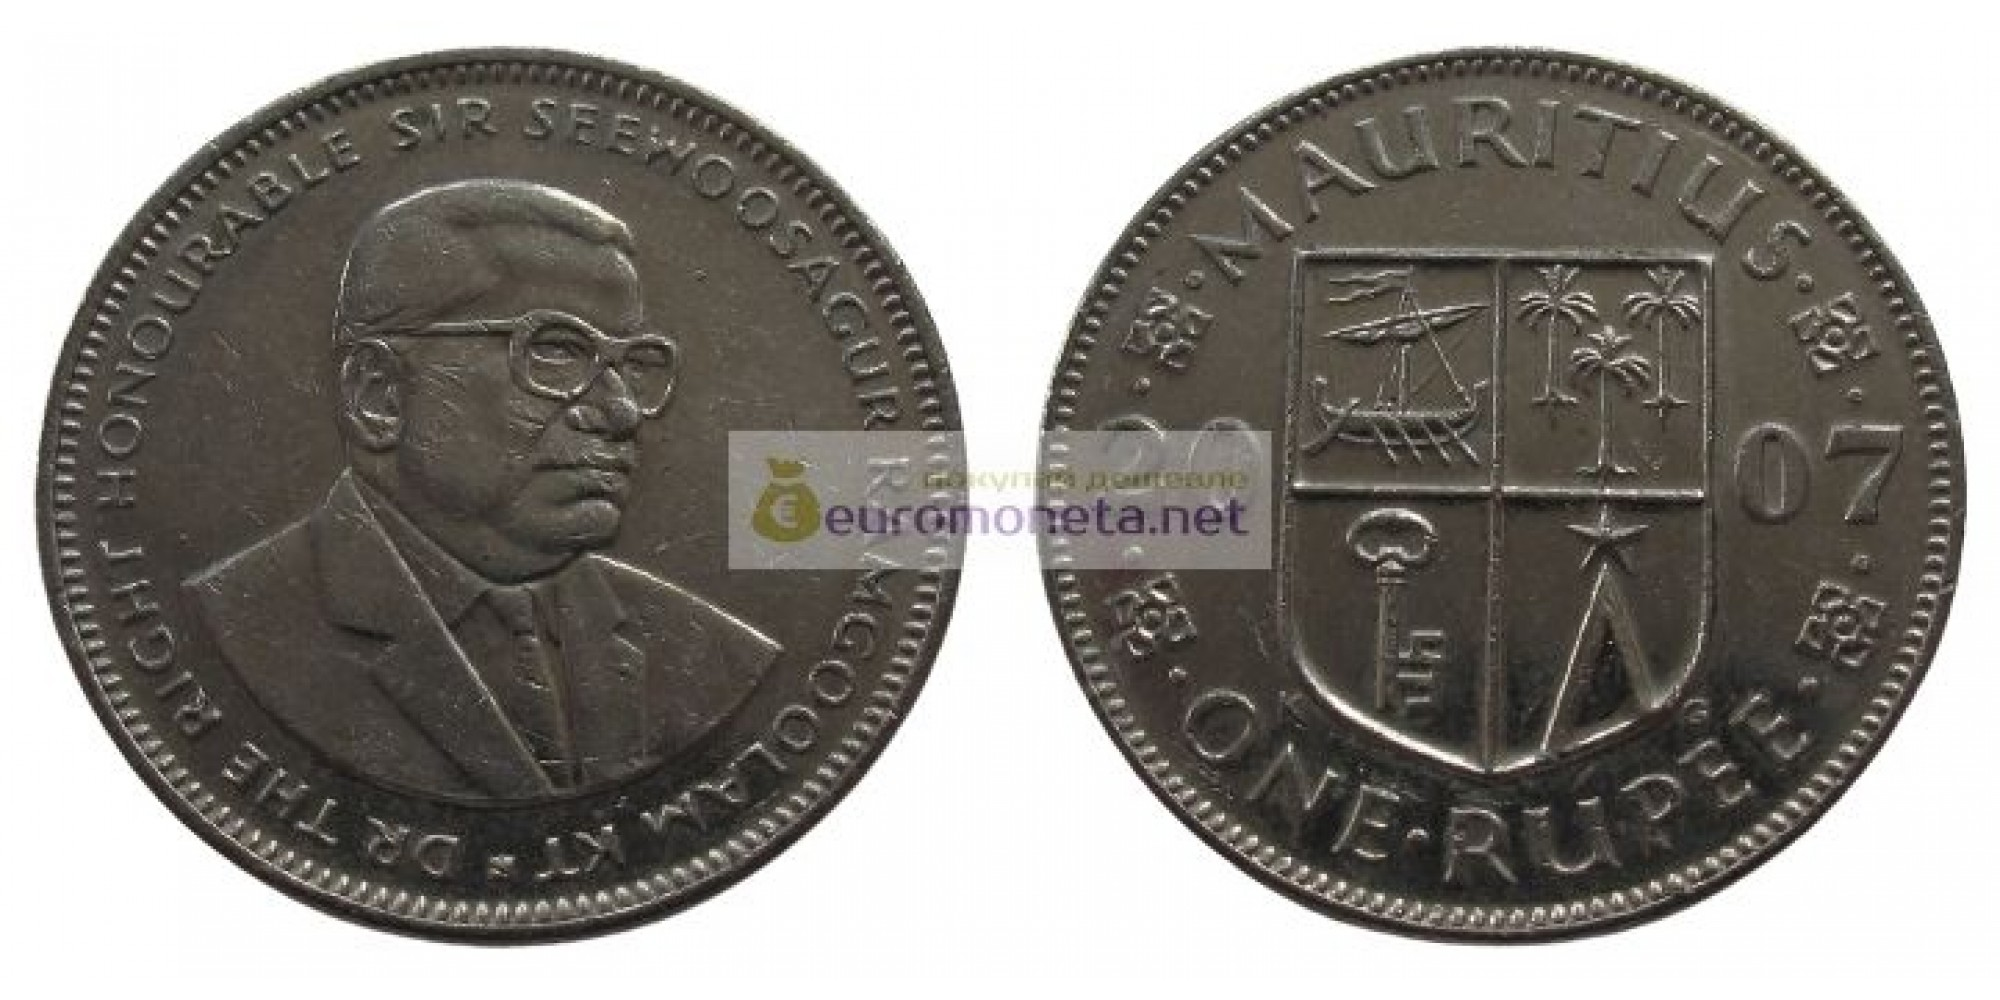 Маврикий 1 рупия 2007 год. Сивусагур Рамгулам